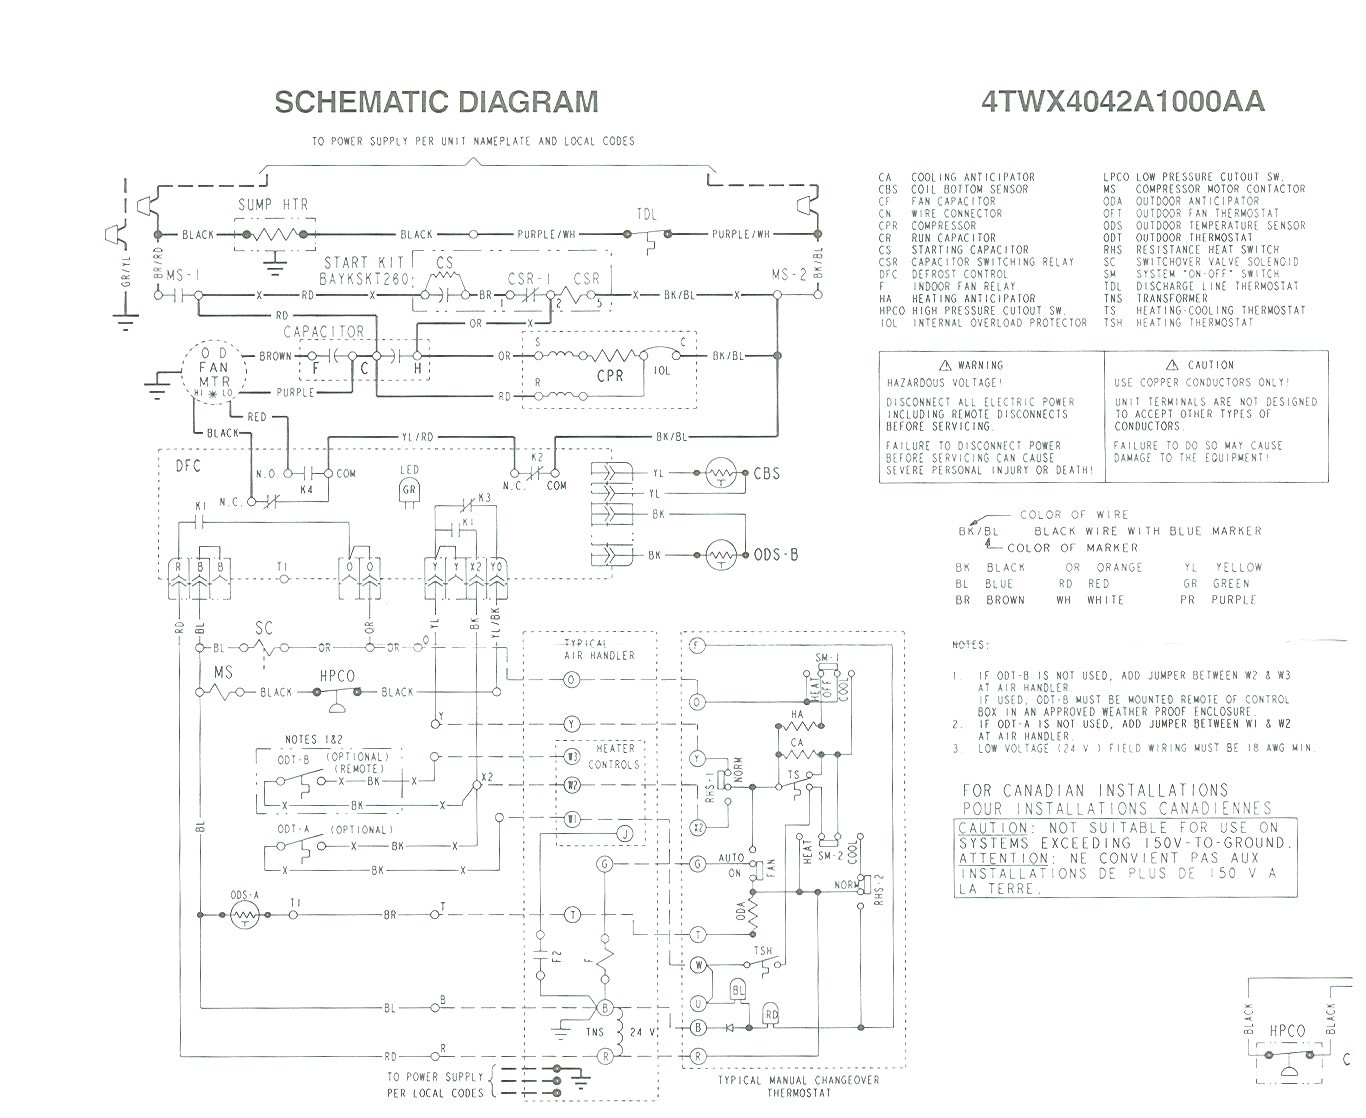 Trane Xl1200 Heat Pump Wiring Diagram